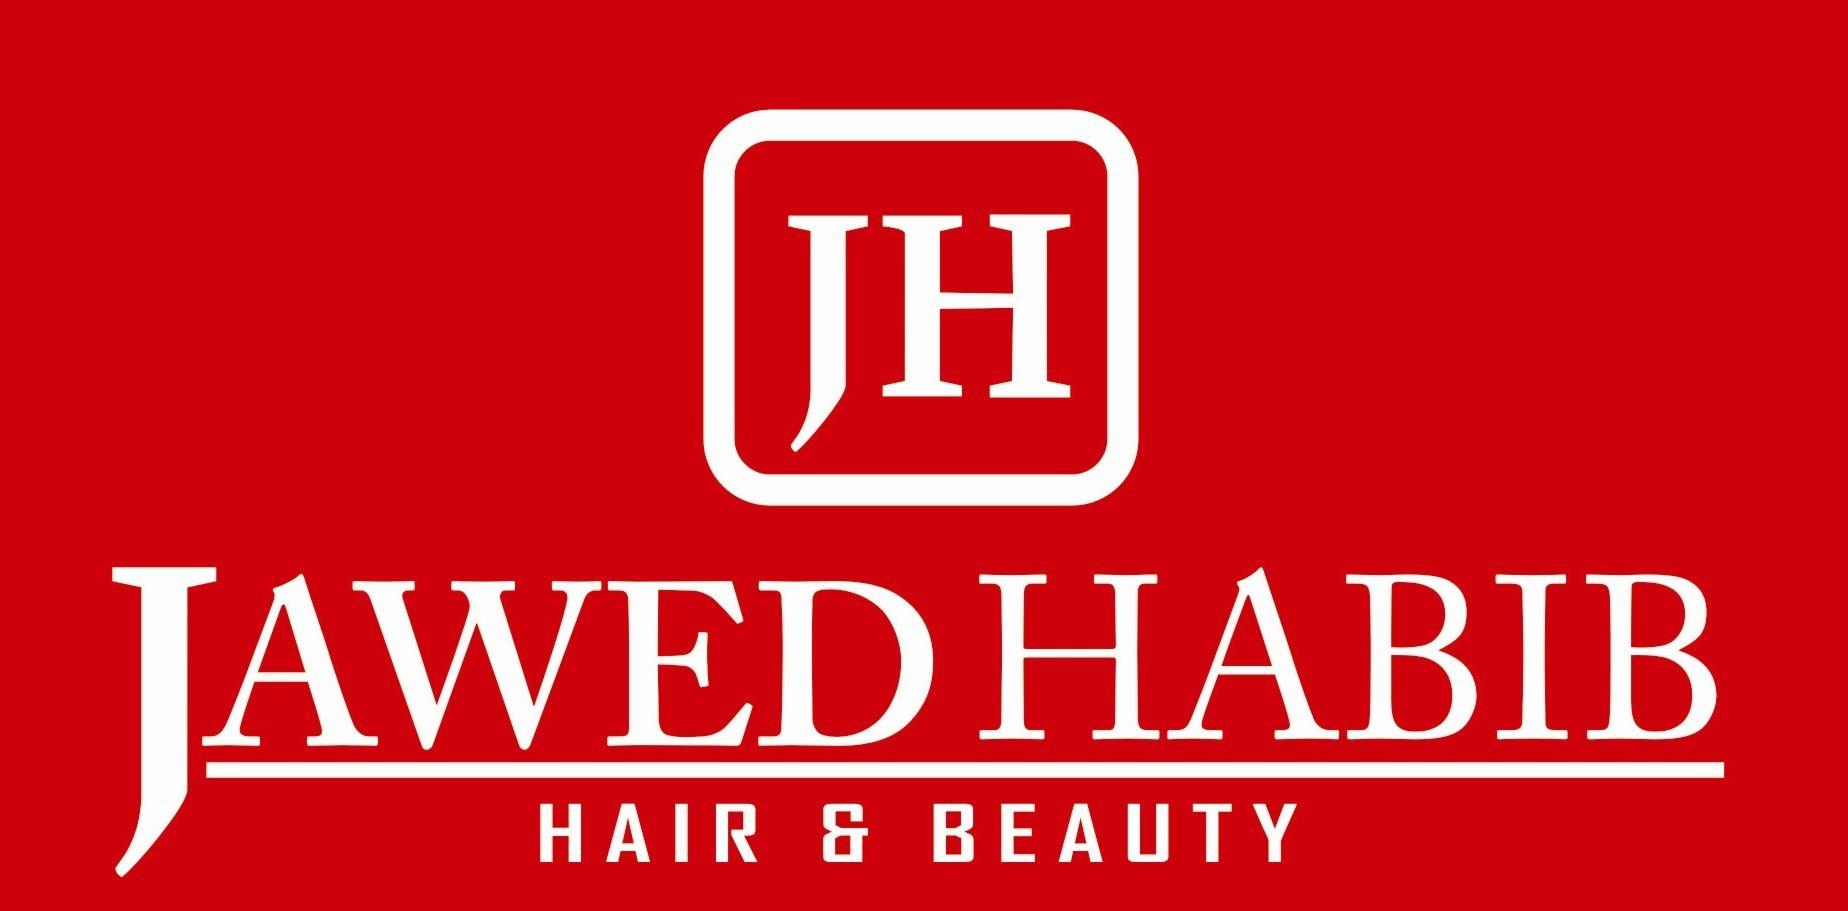 Jawed Habib Hair & Beauty Salons - Koramangala - Bangalore Image